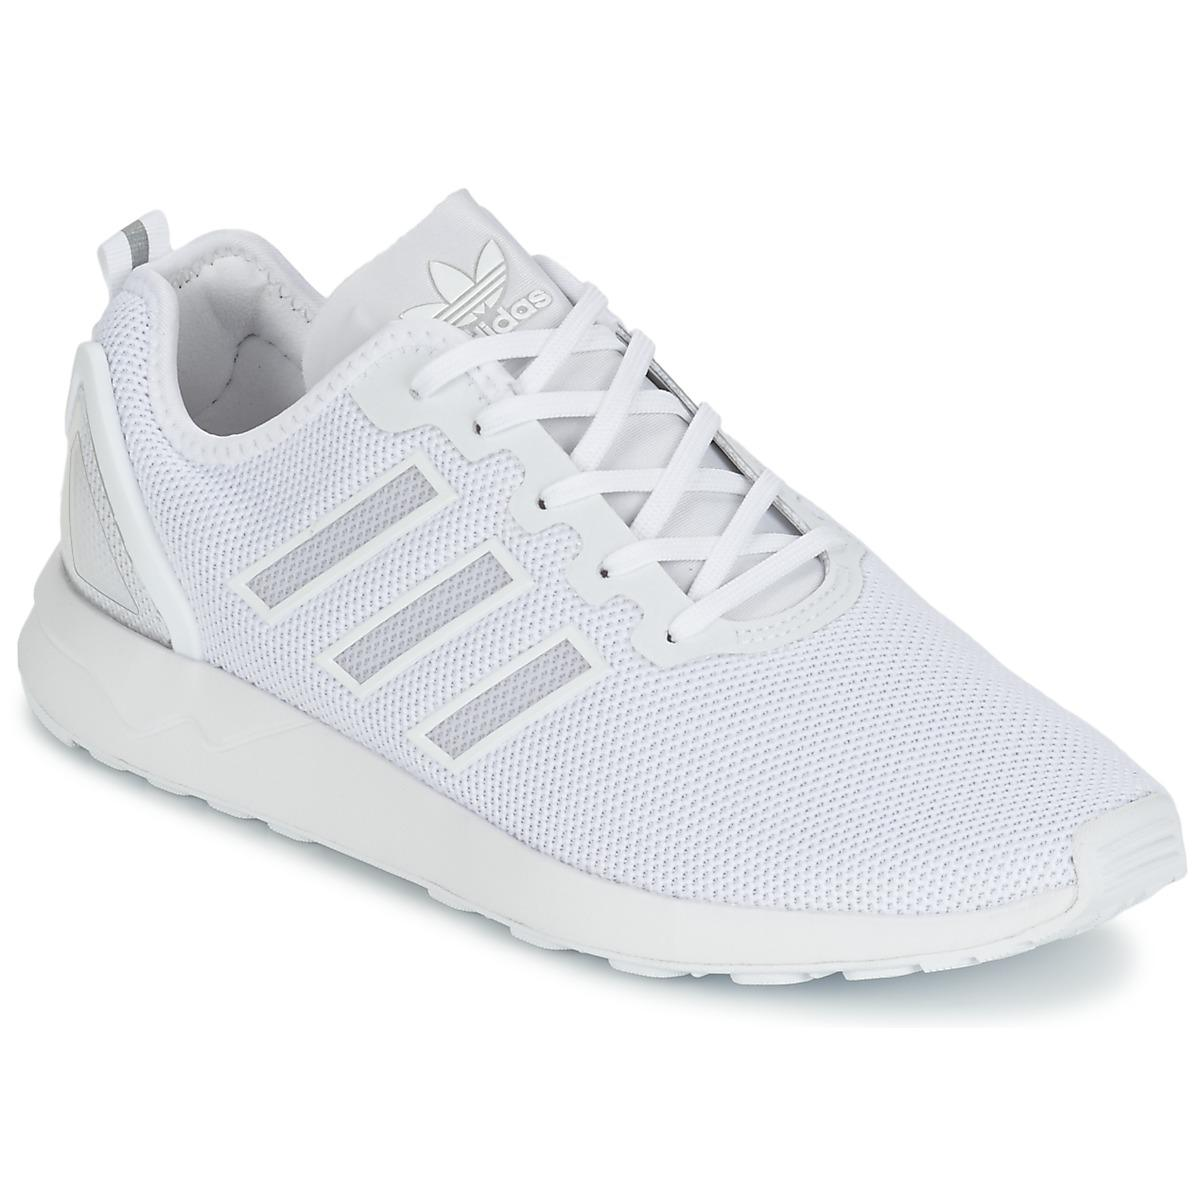 8ce8c2d6bf8e outlet on sale c2bb7 67a9a adidas originals mens zx flux adv asym ...